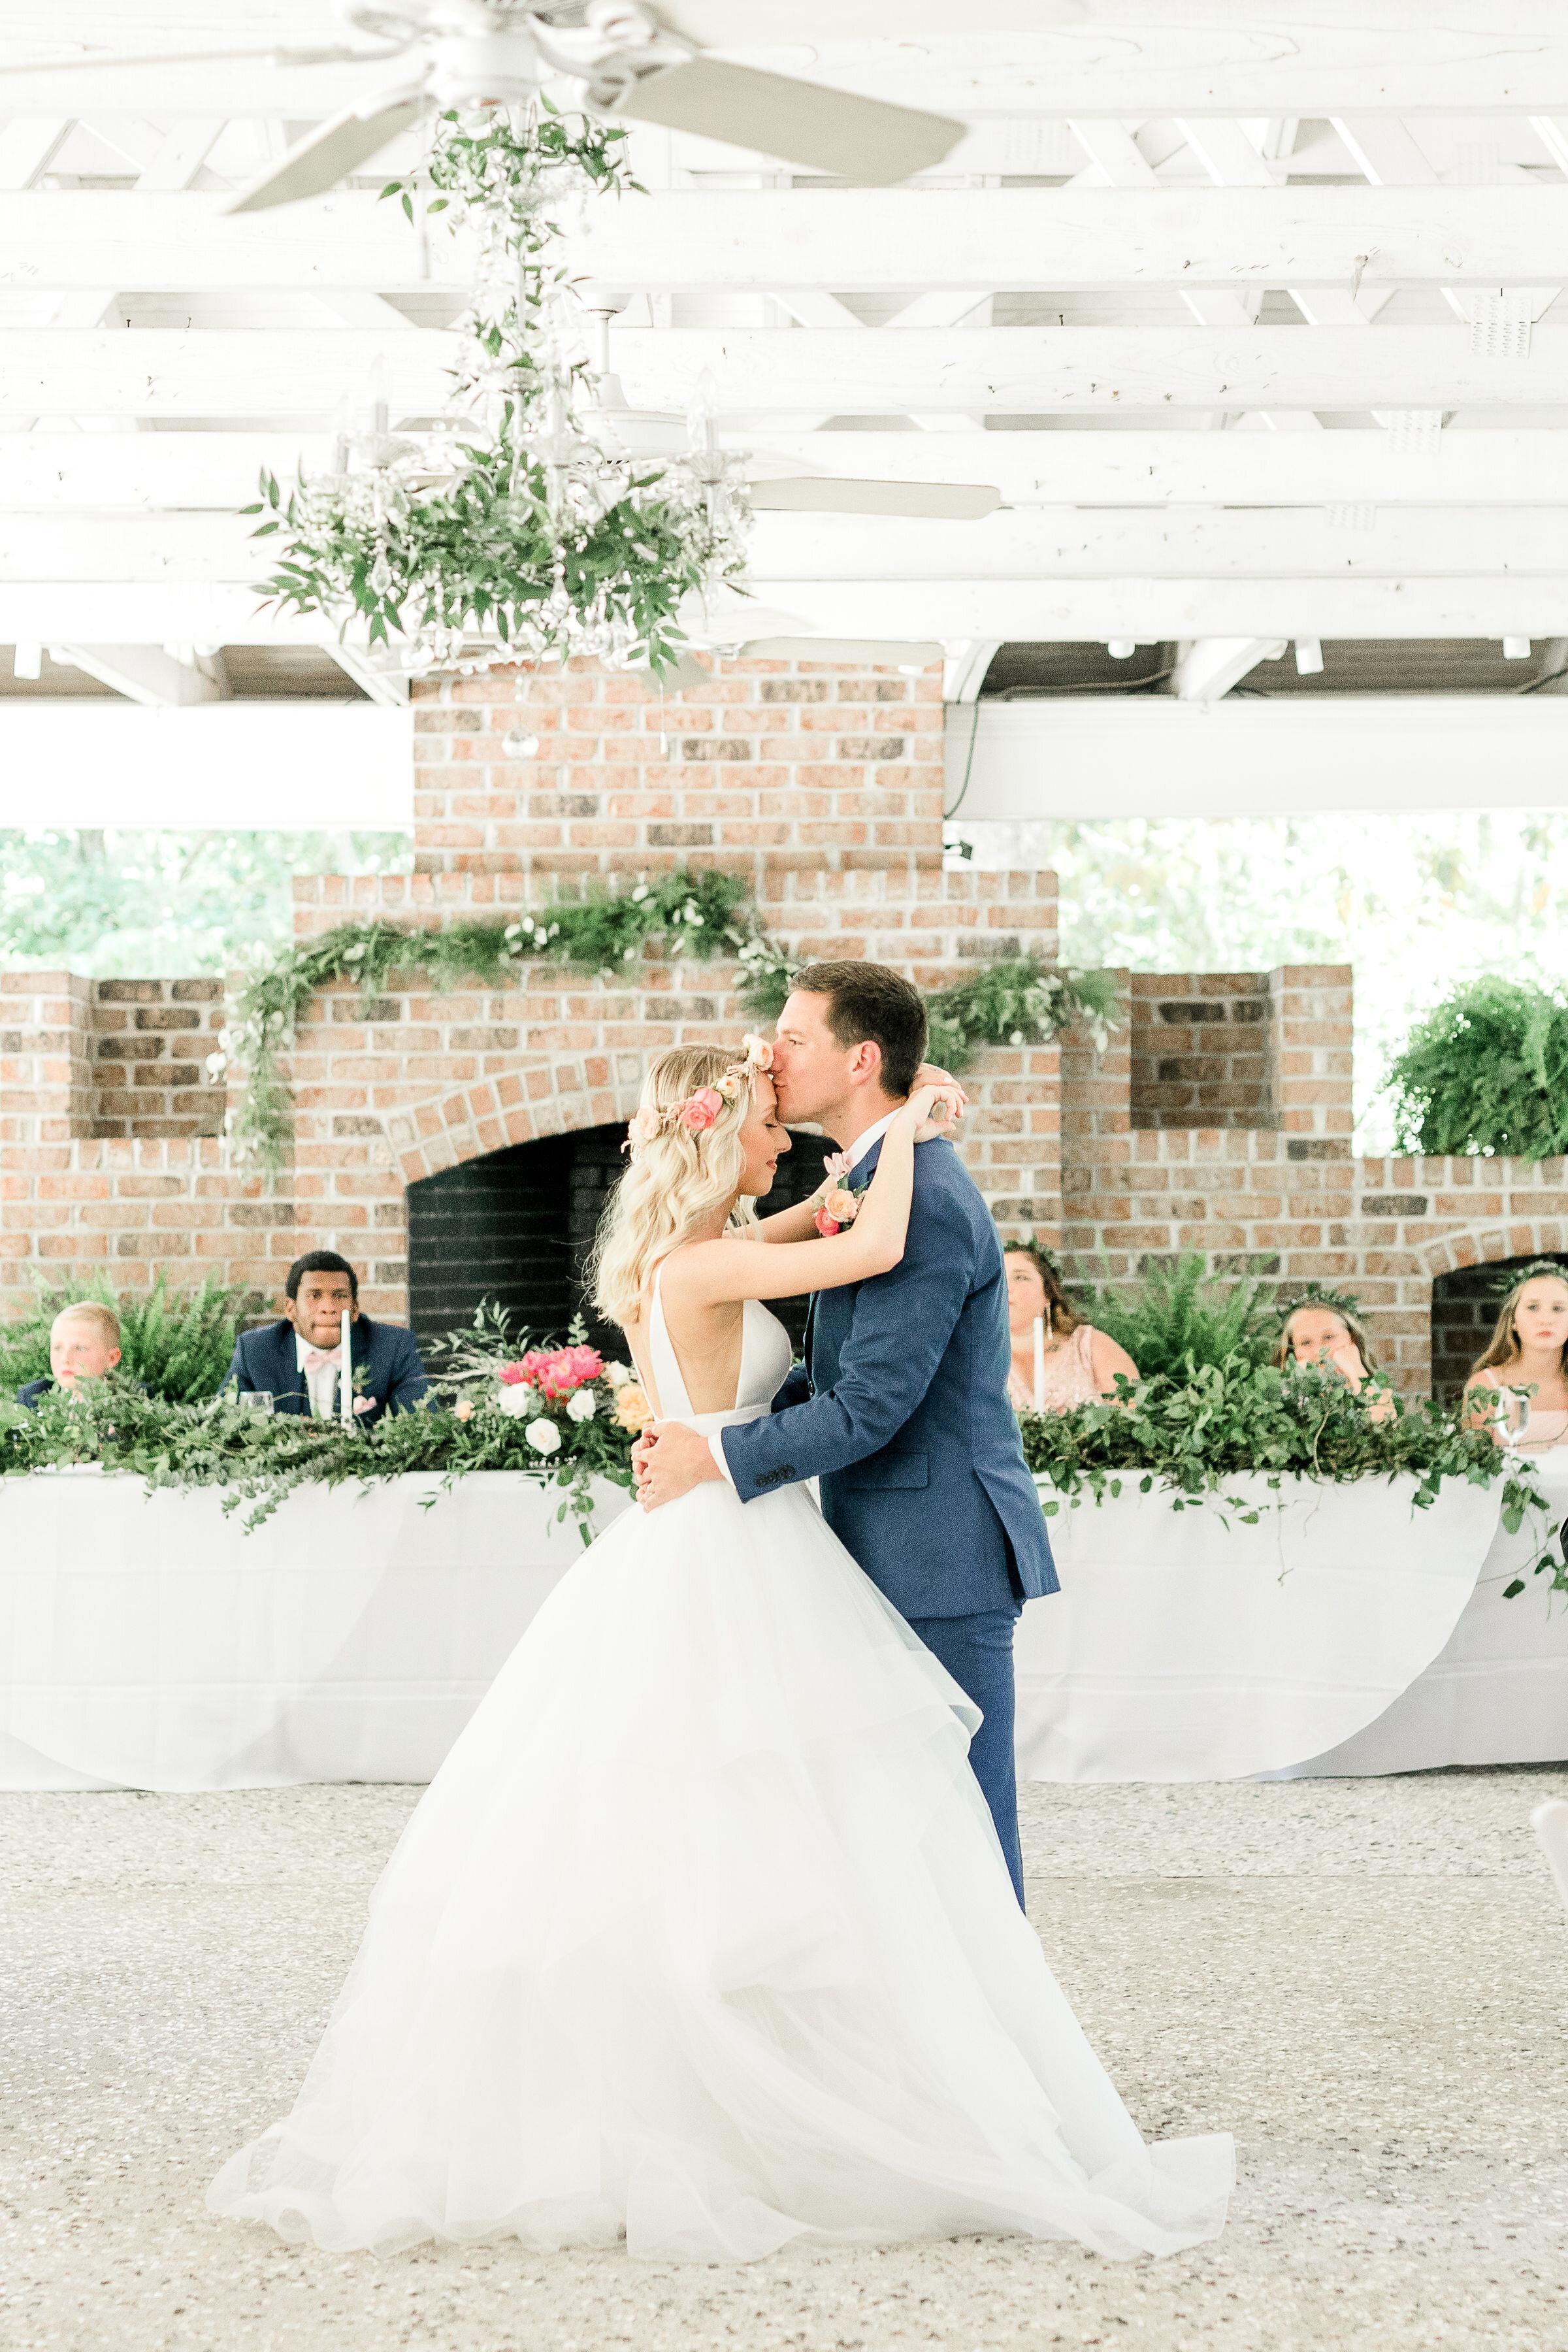 first-dance-wedding-savannah-wedding-pink-flowers-pink-and-green-southern-couple-mackey-house-greenery.jpg